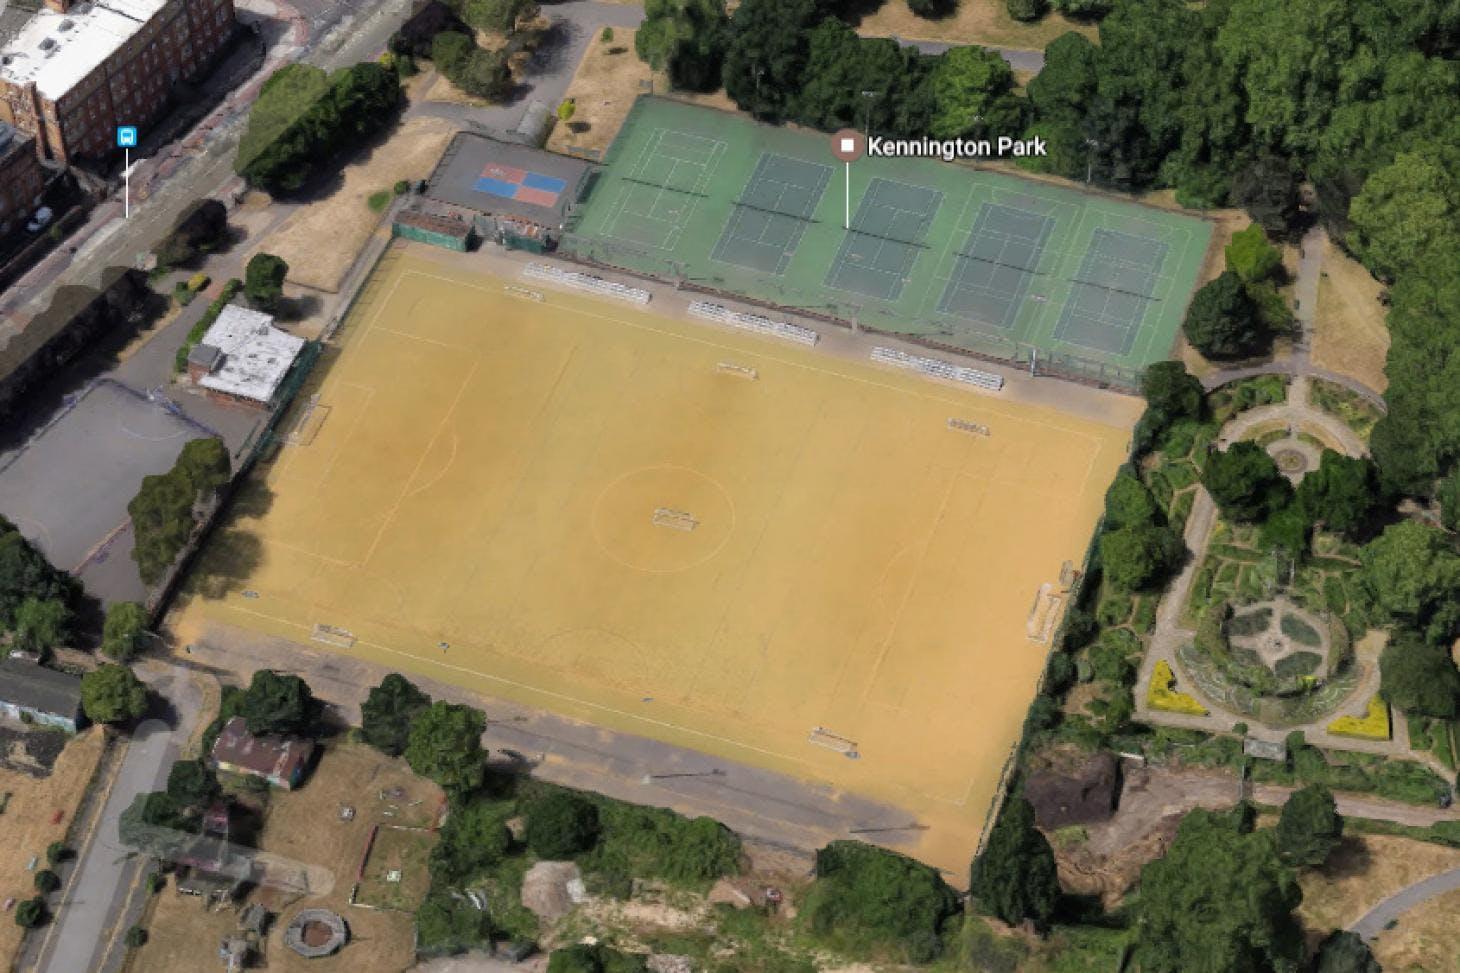 Kennington Park 5 a side | Astroturf football pitch